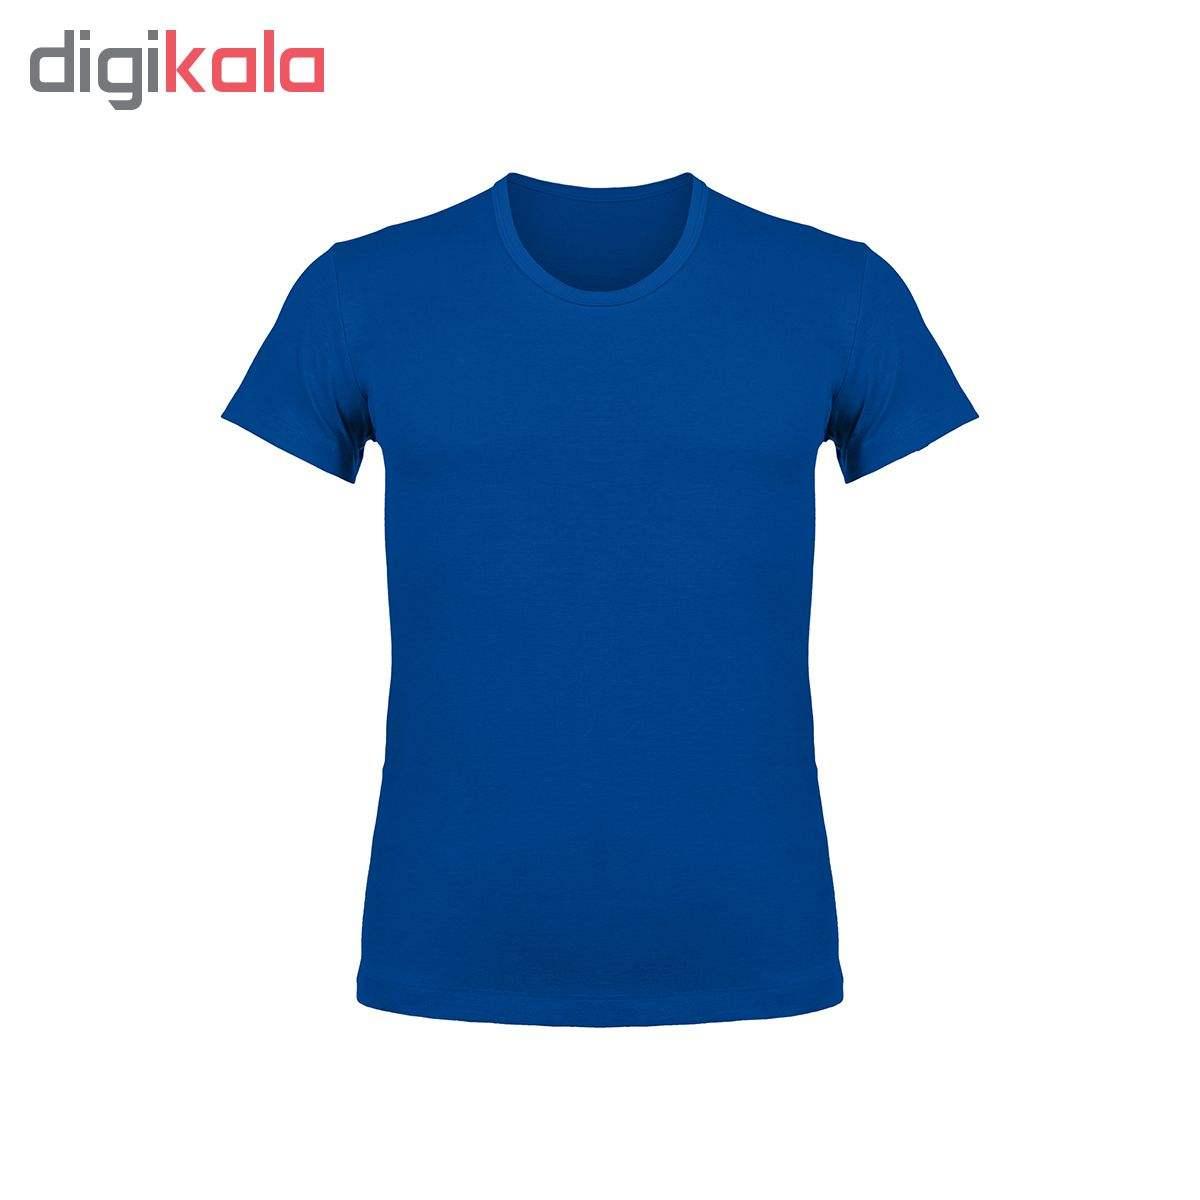 زیرپوش مردانه کیان تن پوش مدل U Neck Shirt Classic BC main 1 1